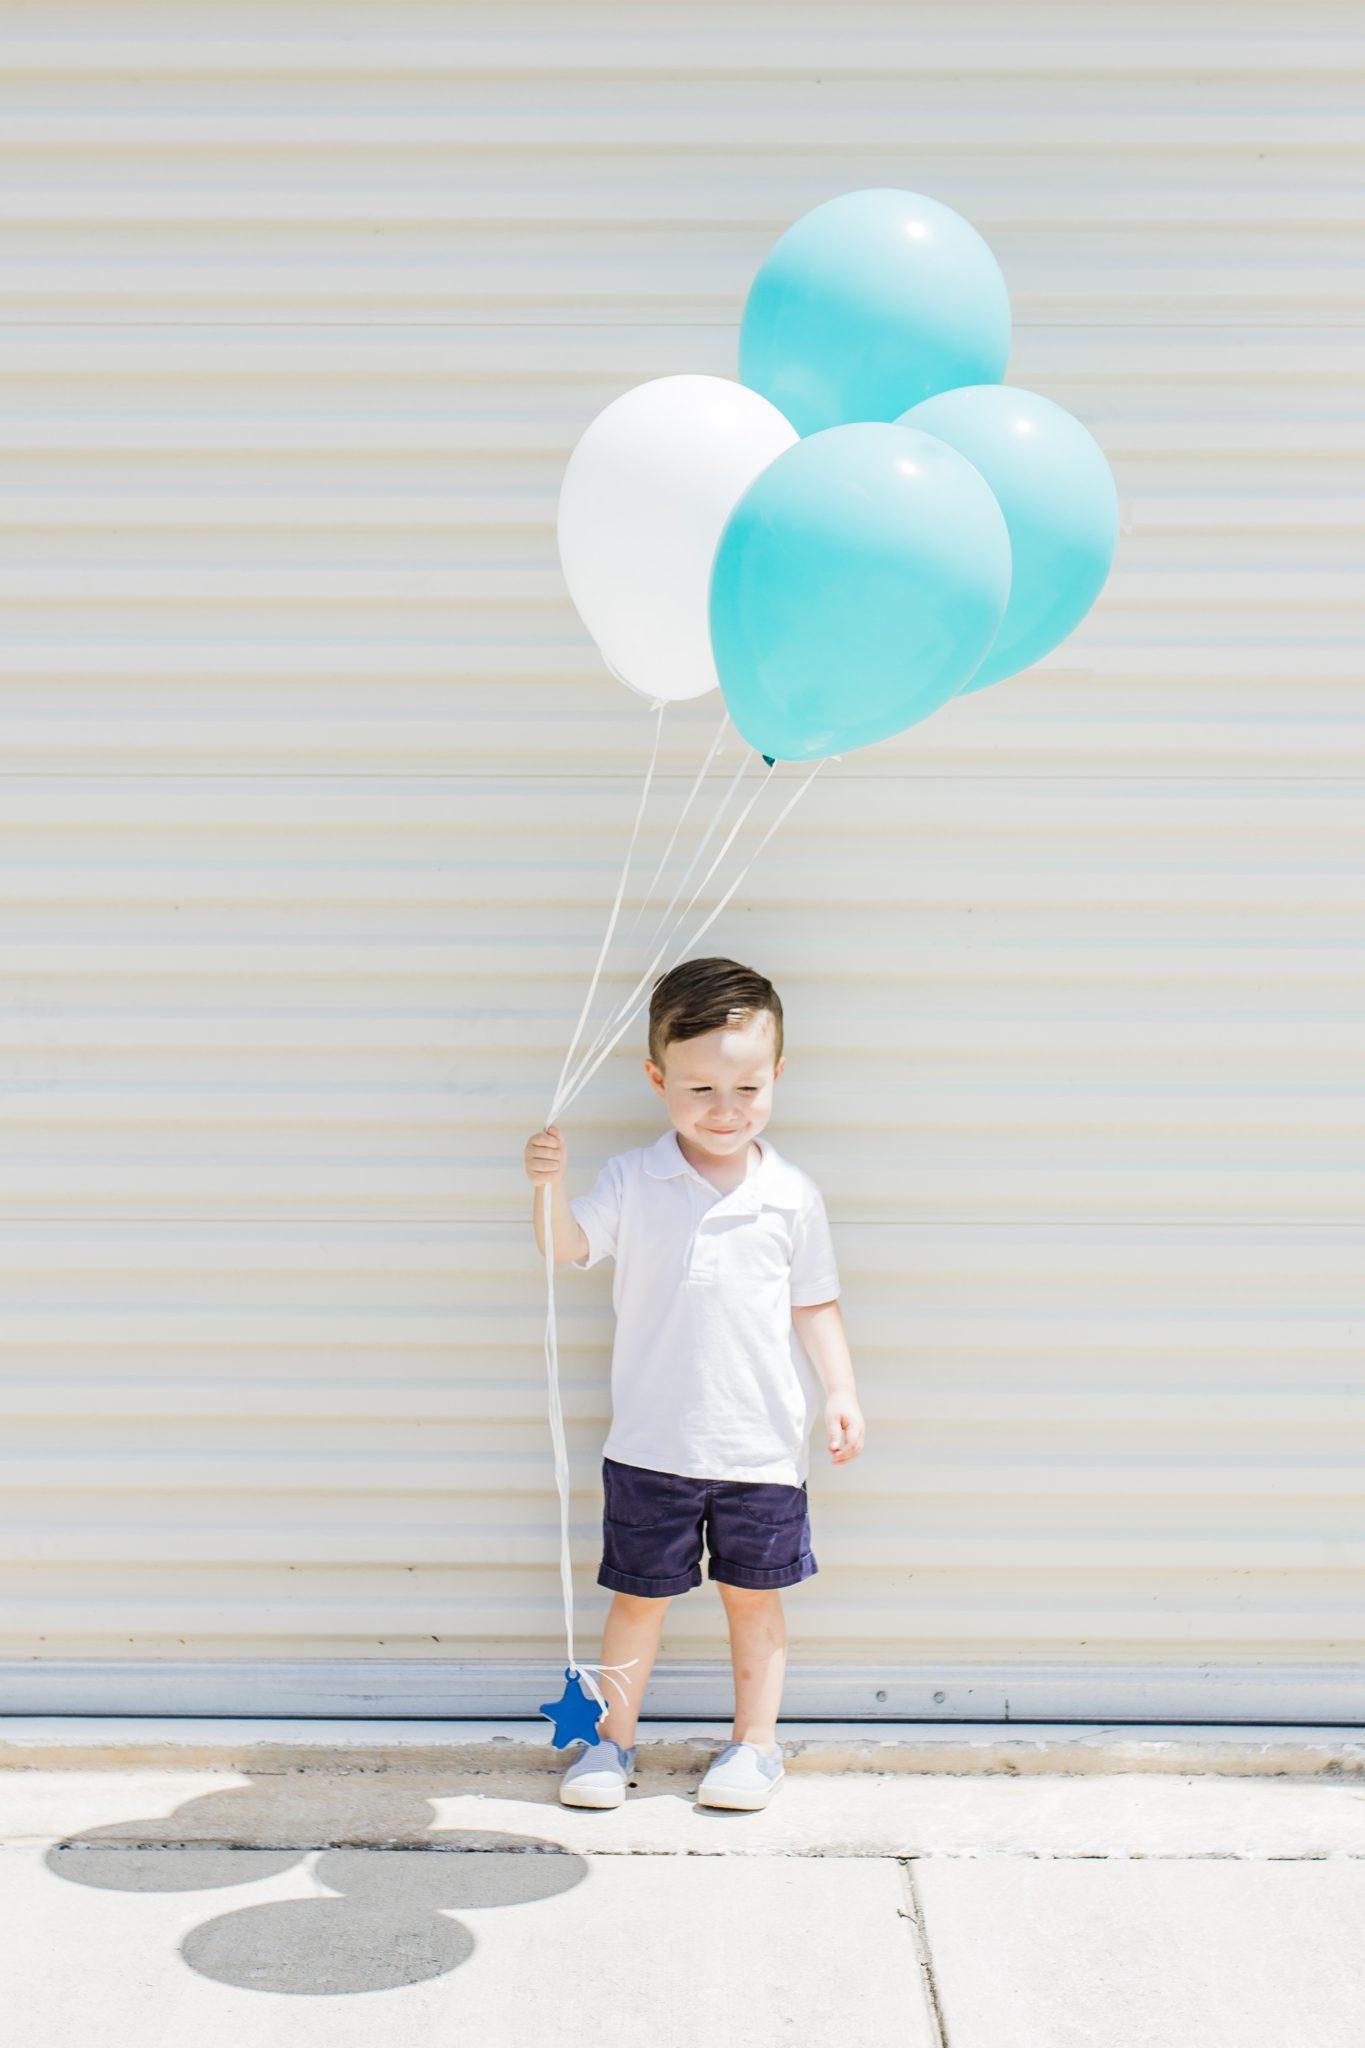 3rd birthday photos, happy birthday boy, age three photos, birthday photoshoot, superhero birthday